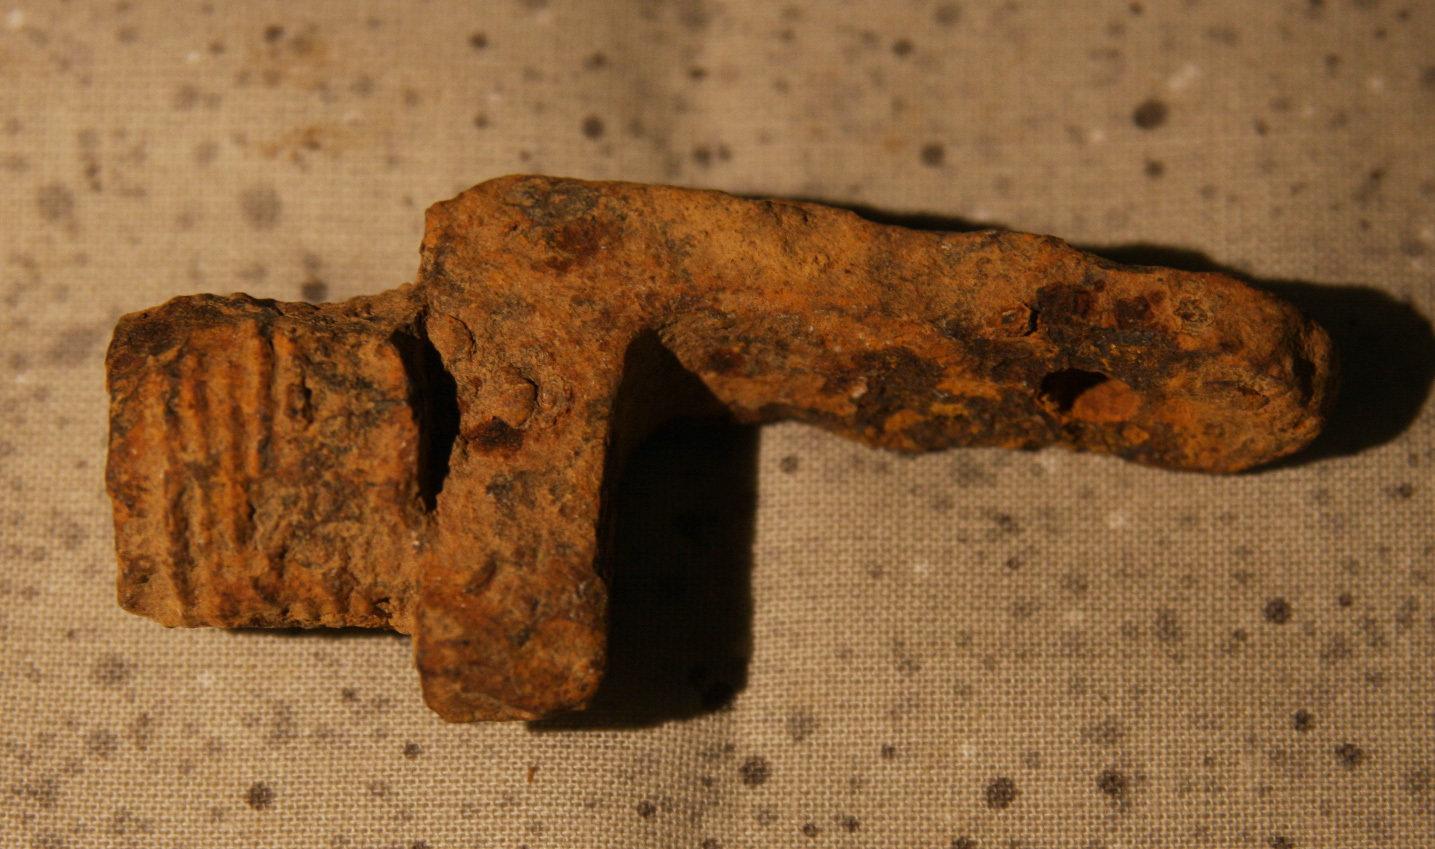 JUST ADDED ON 5/2 - THE BATTLE OF CEDAR CREEK - Breech Plug from the Barrel of an Enfield Musket